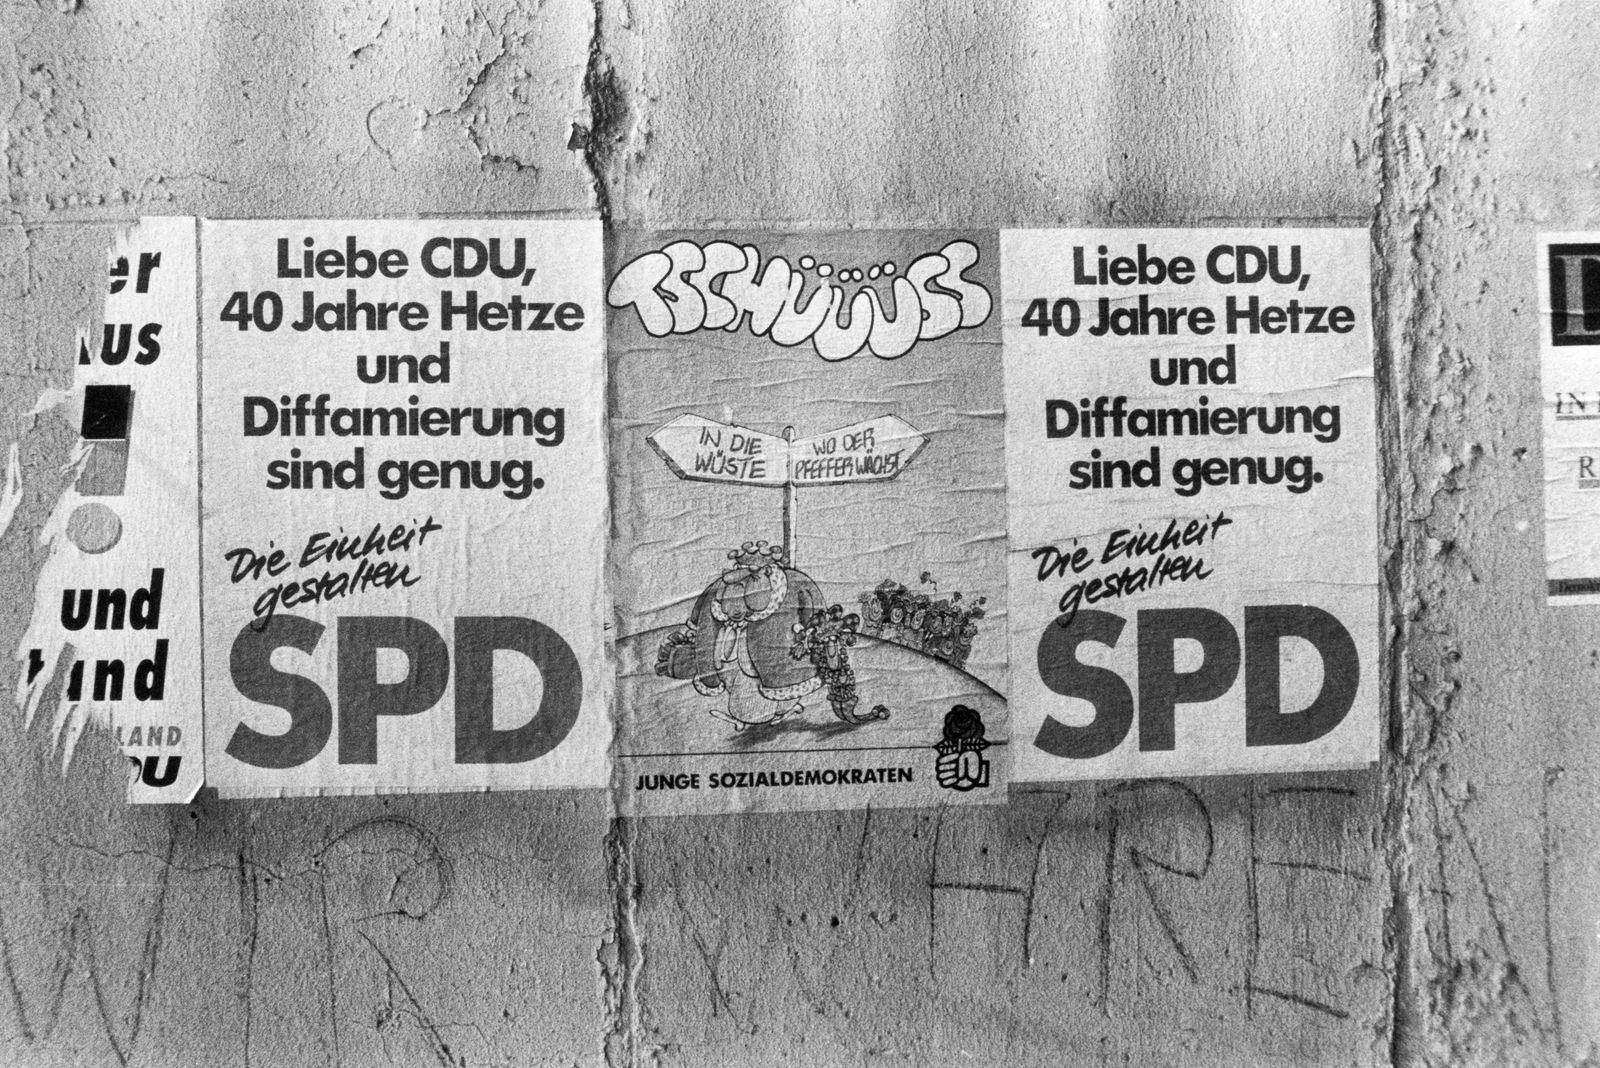 Volkskammerwahl 1990 - Wahlplakate der SPD in Berlin